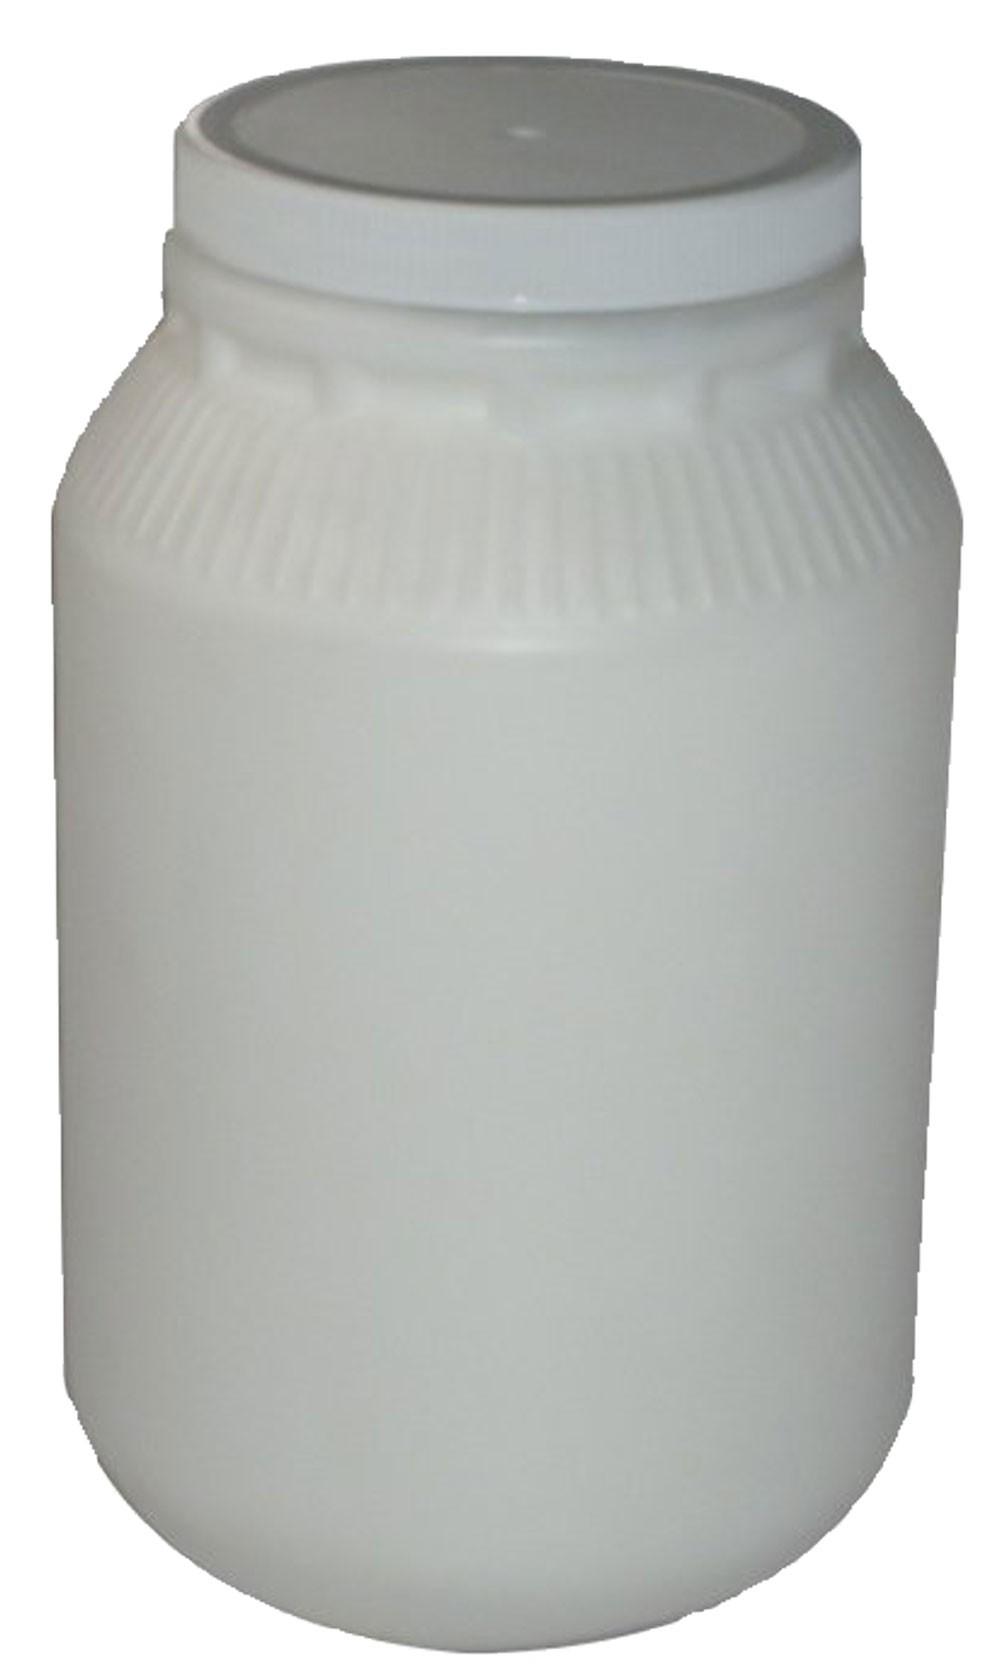 Cab-O-Sil Fumed Silica Flotant, 1-Gallon